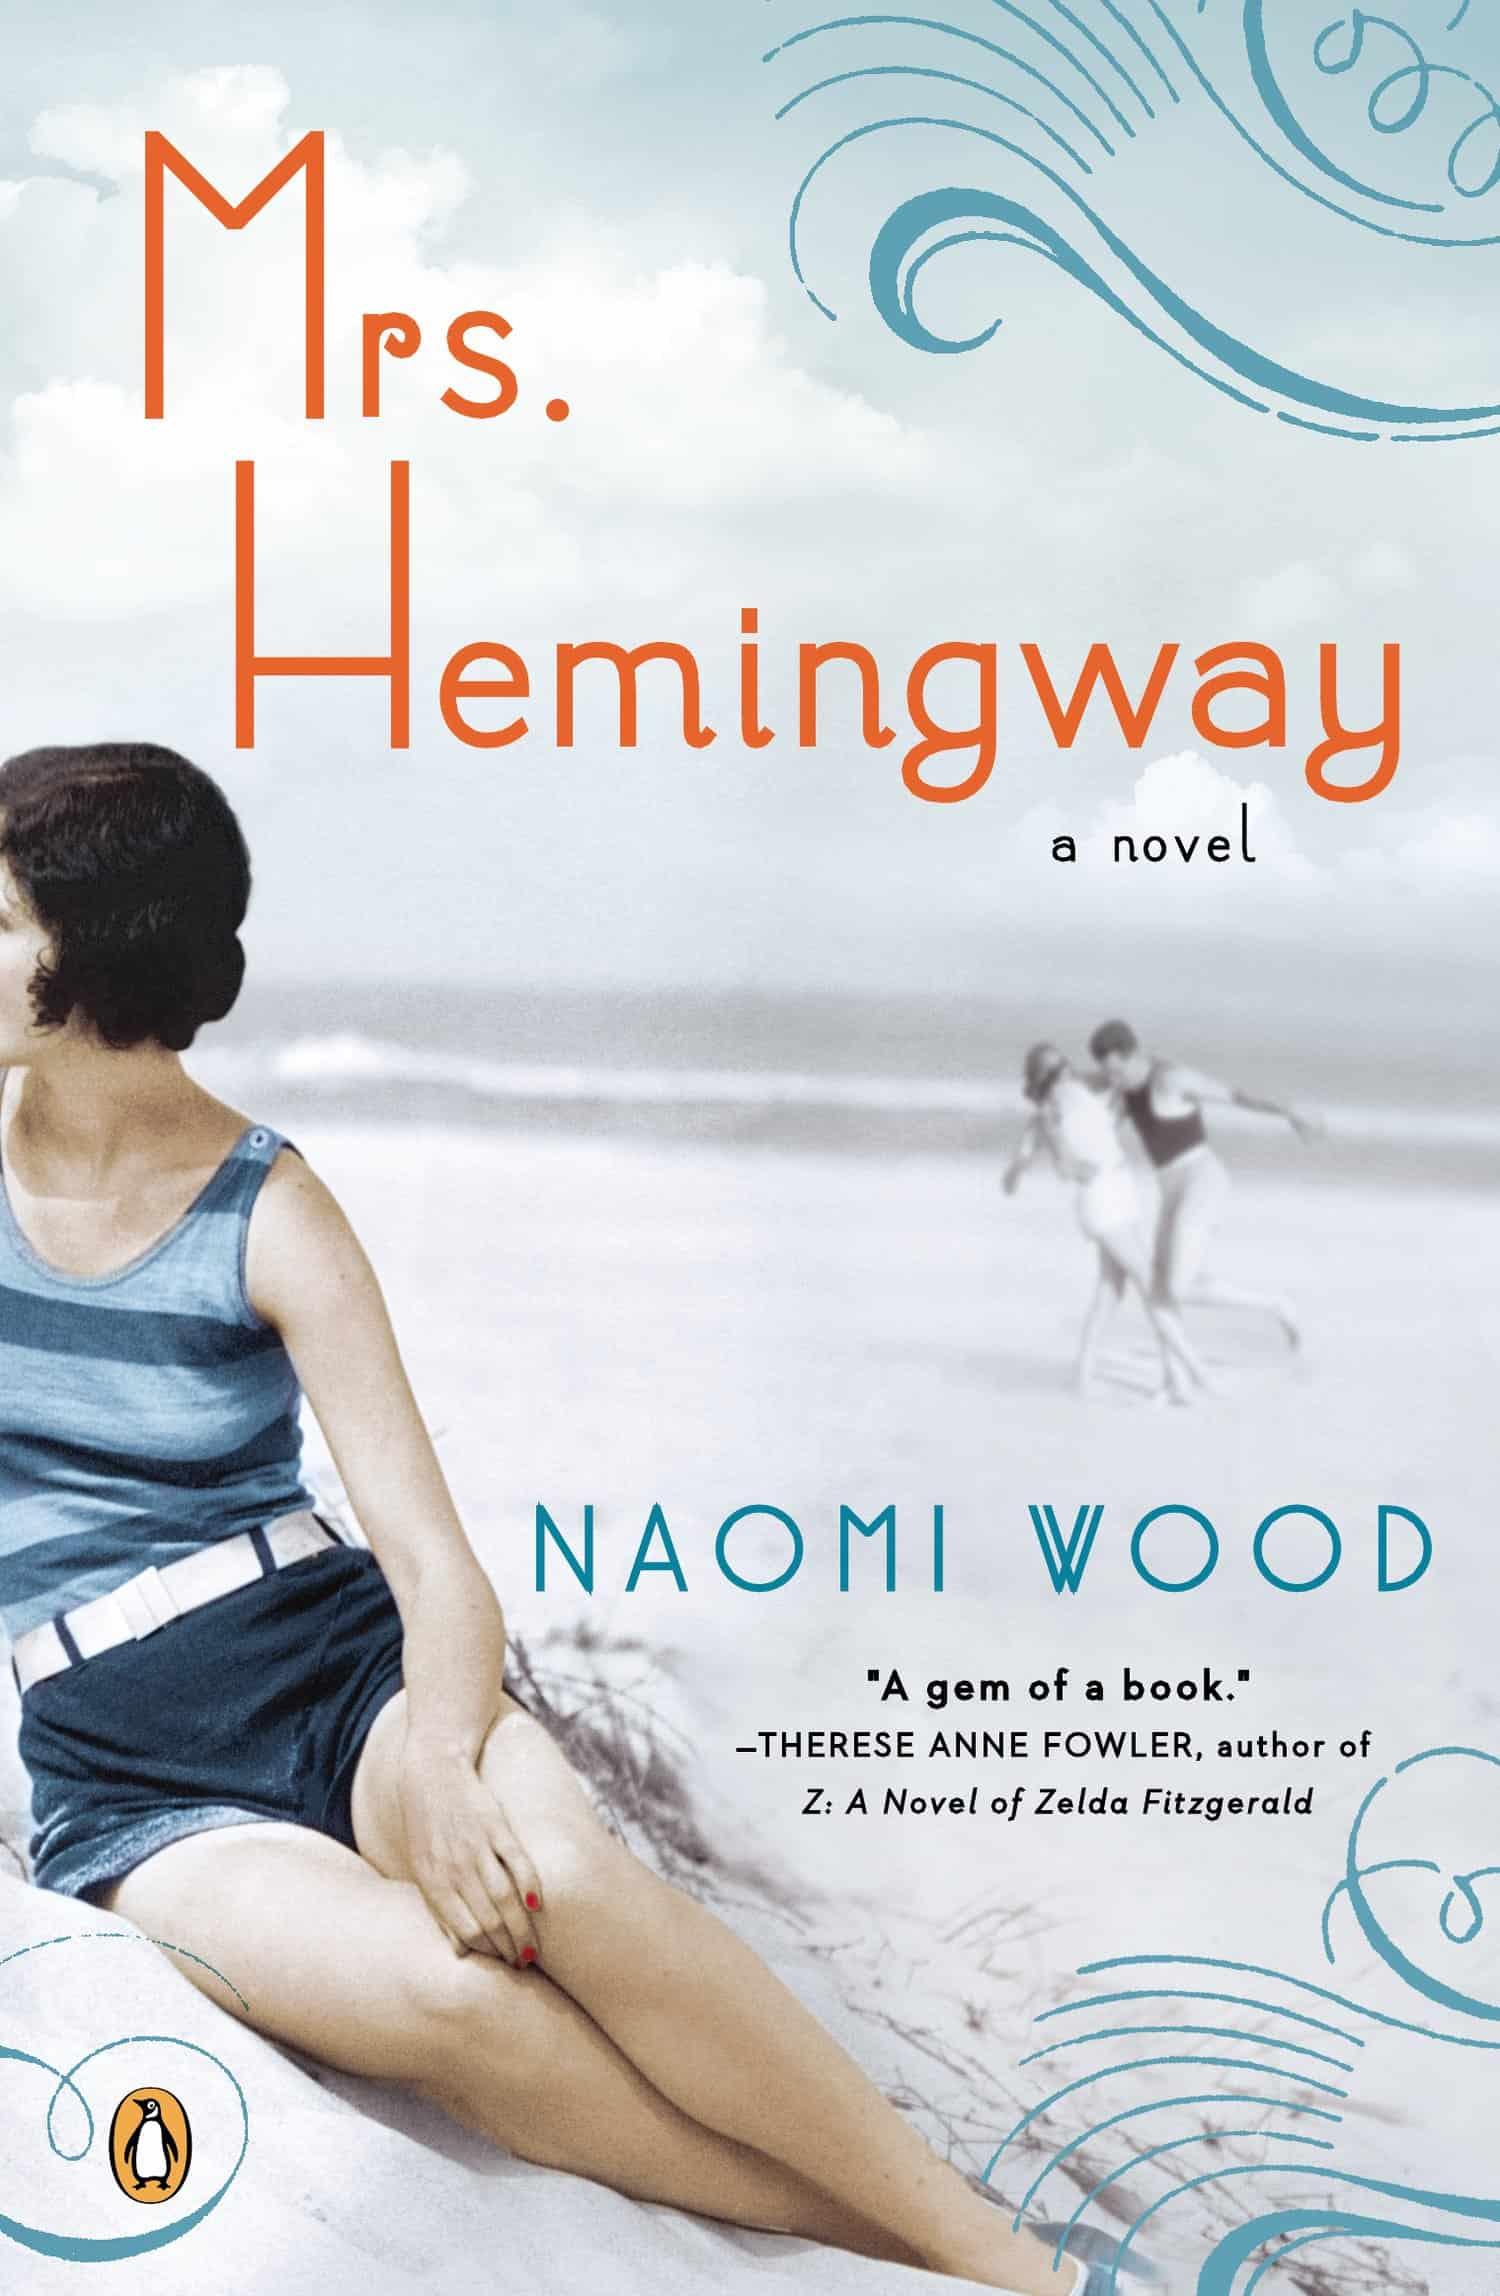 Mrs. Hemingway - A Novel